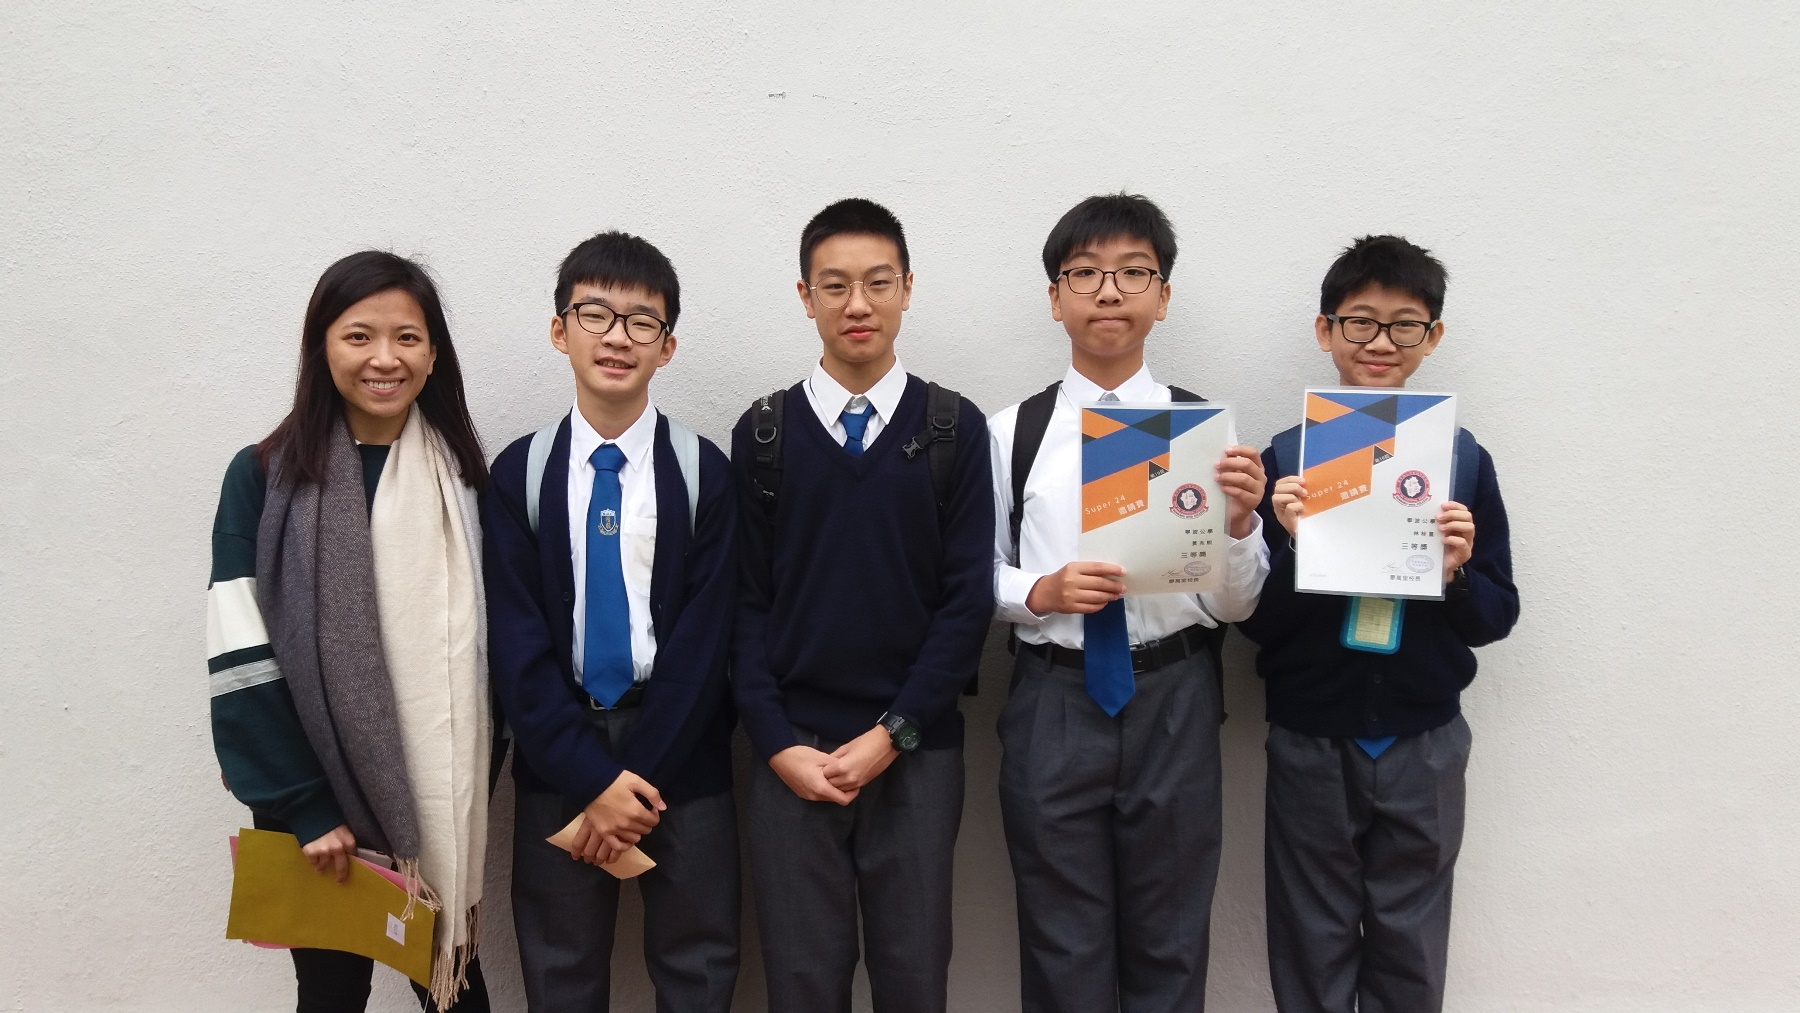 https://npc.edu.hk/sites/default/files/20181208_111345.jpg